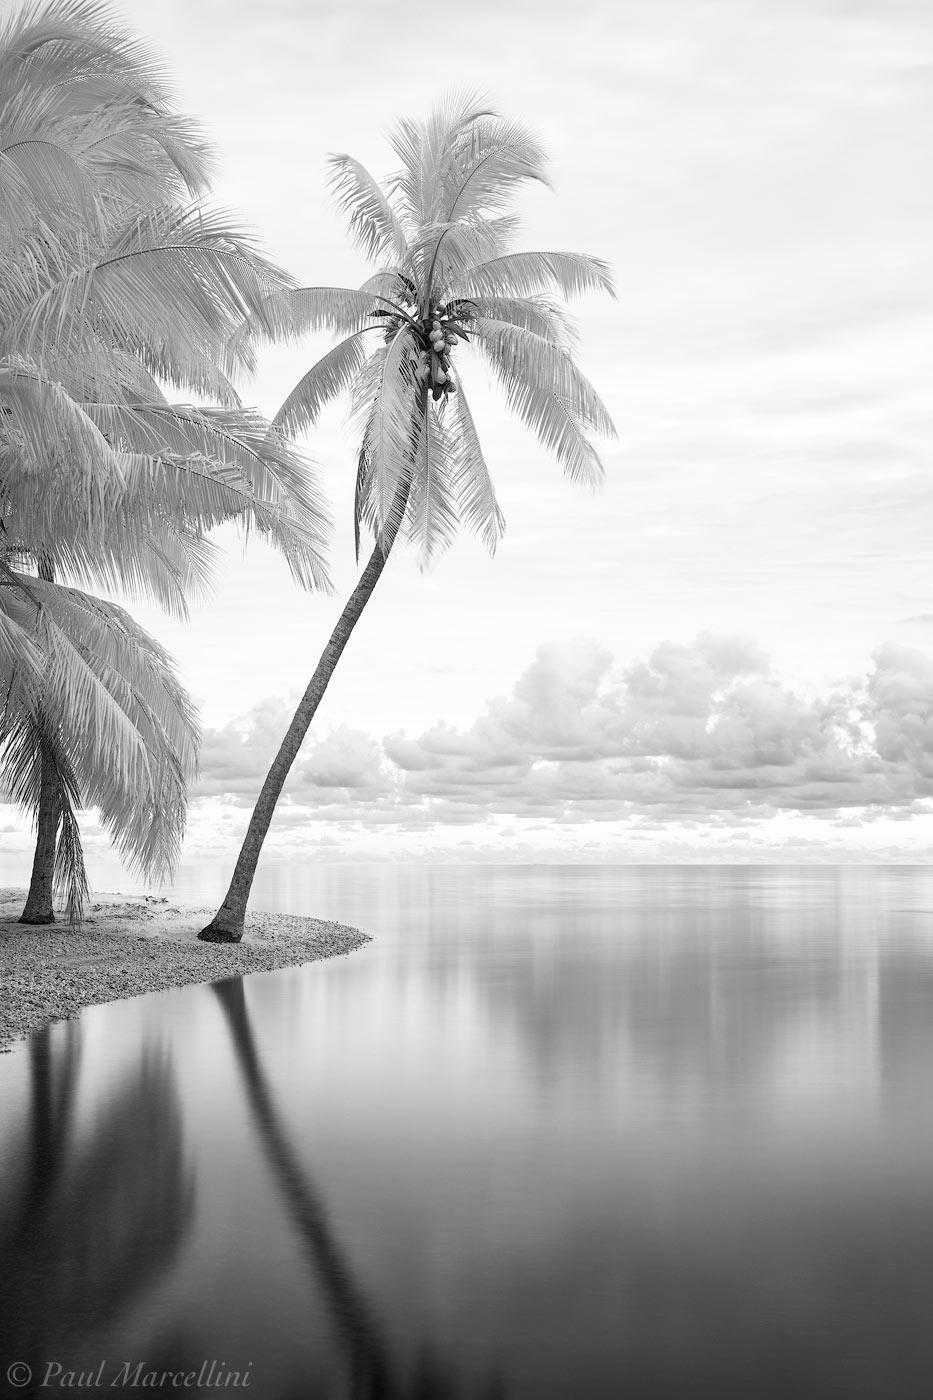 Matheson Hammock, Miami, Florida, palm, photo